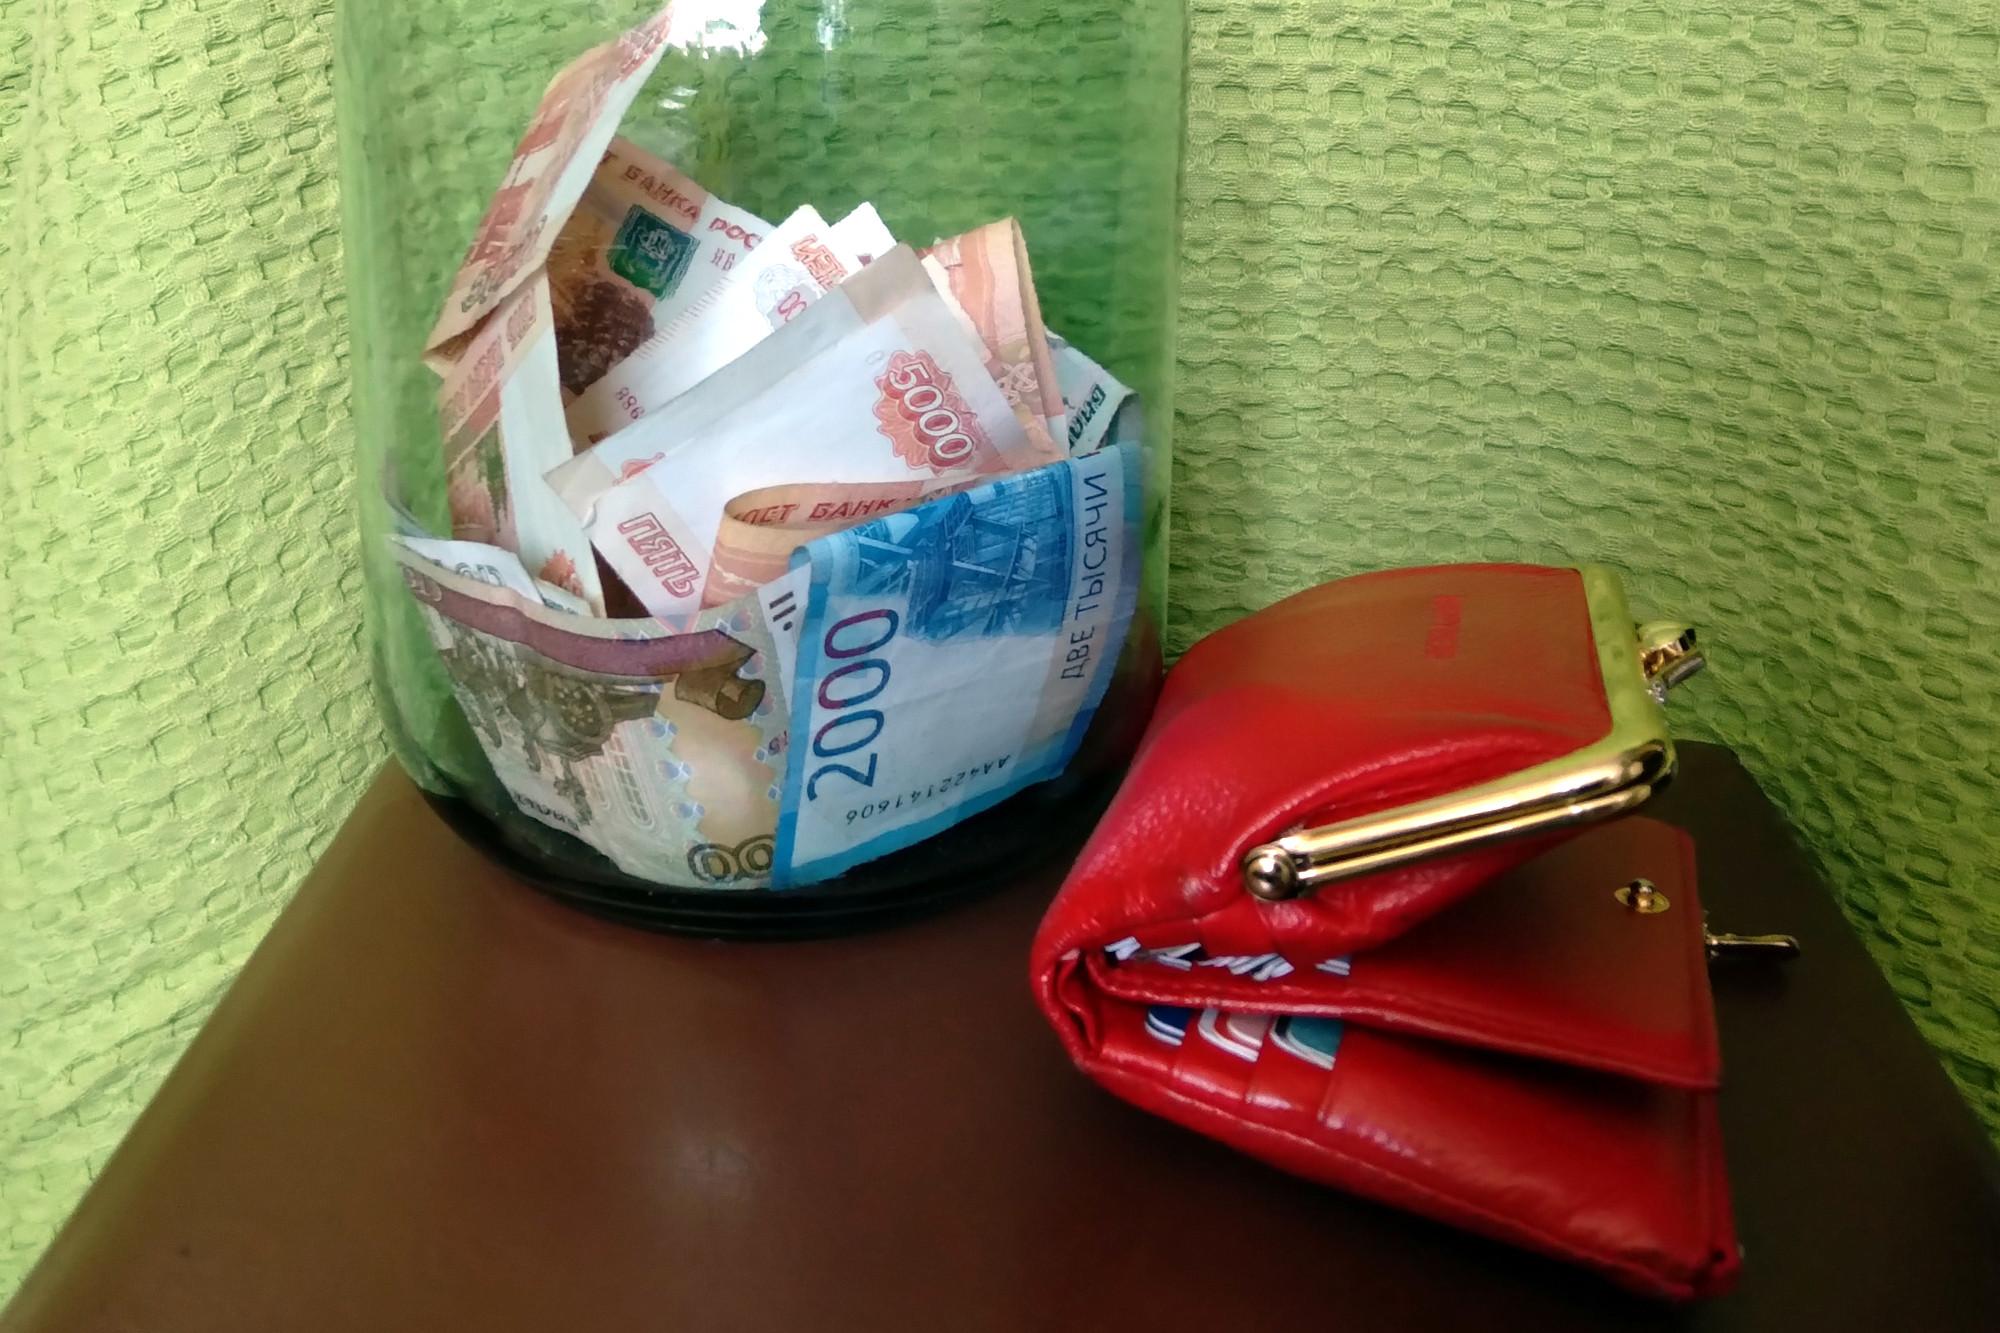 деньги, банкноты, сбережения, банка, кошелёк